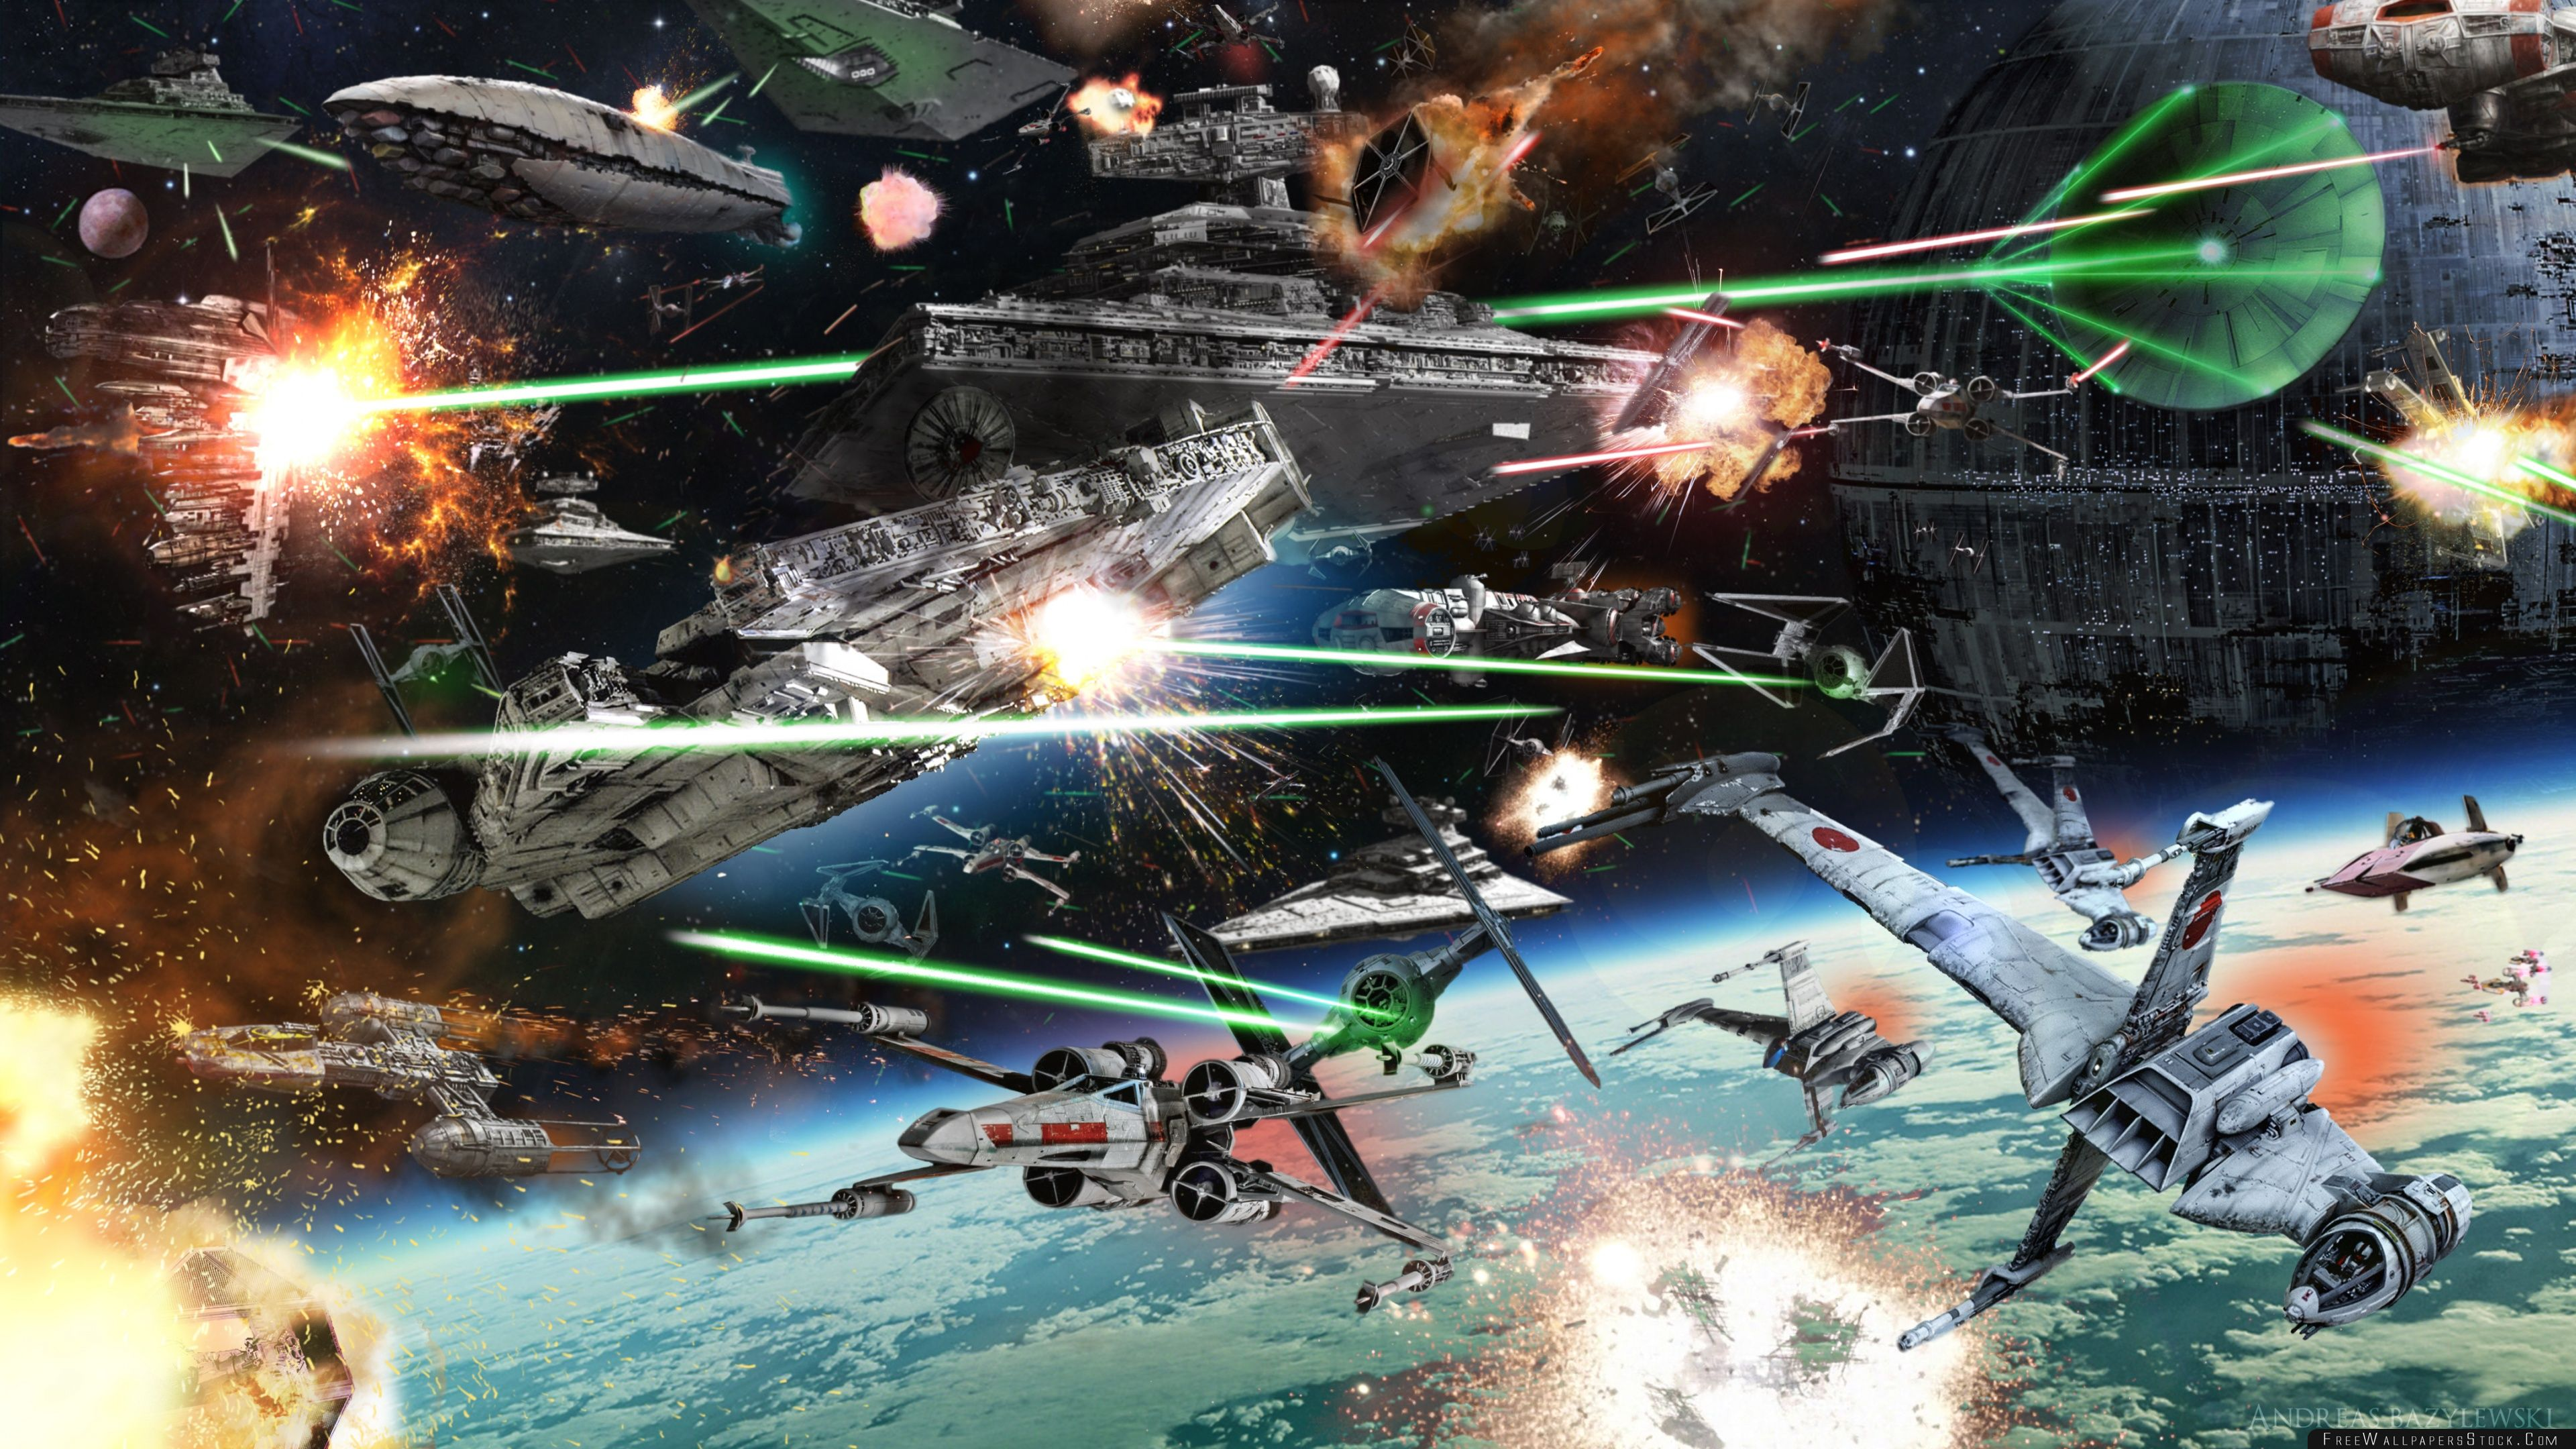 Download Free Wallpaper Star Wars Space Battle